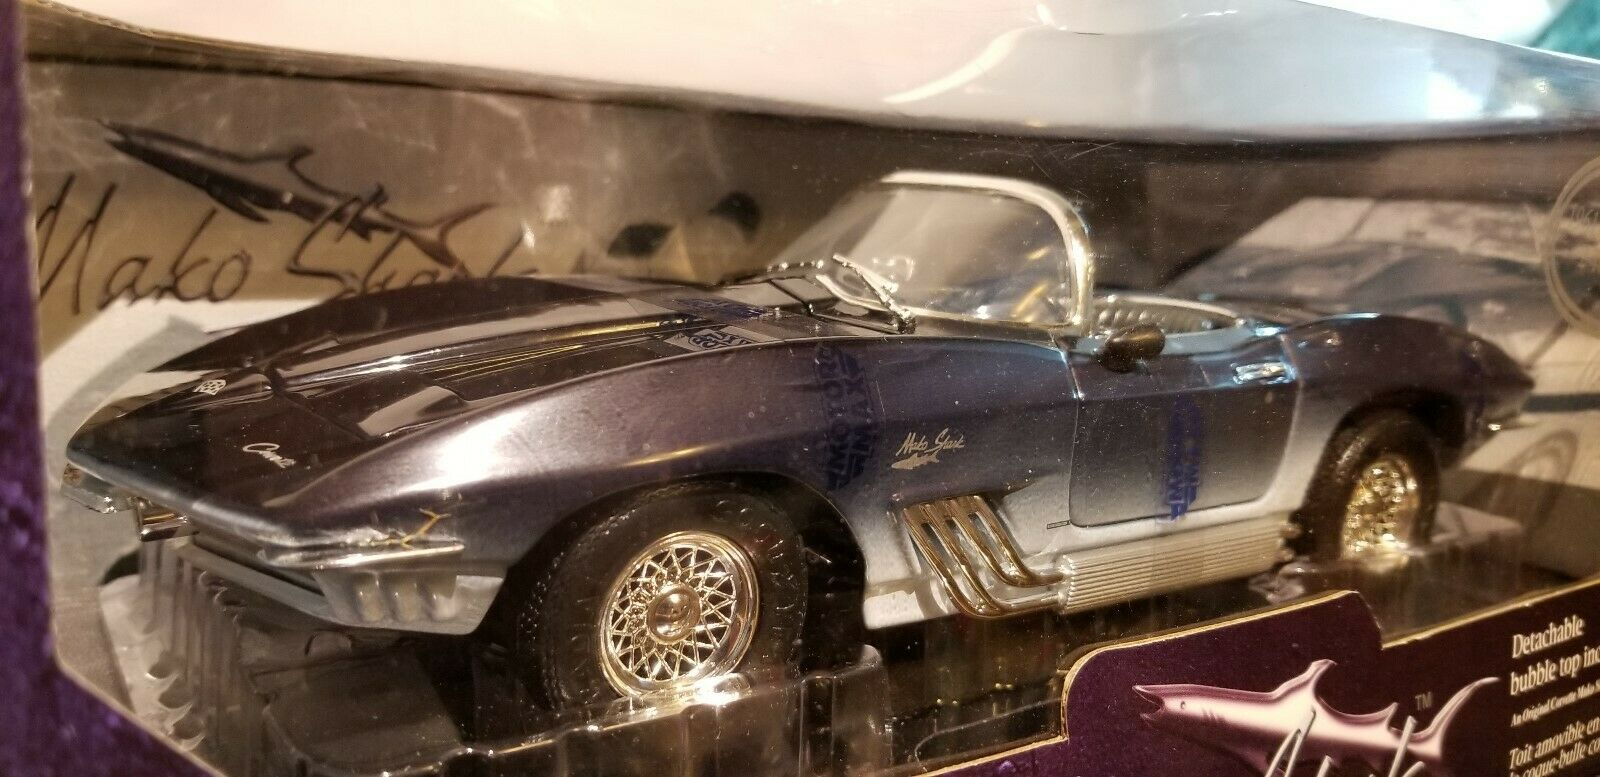 61 Corvette Mako Shark Concept - NIB 1 18